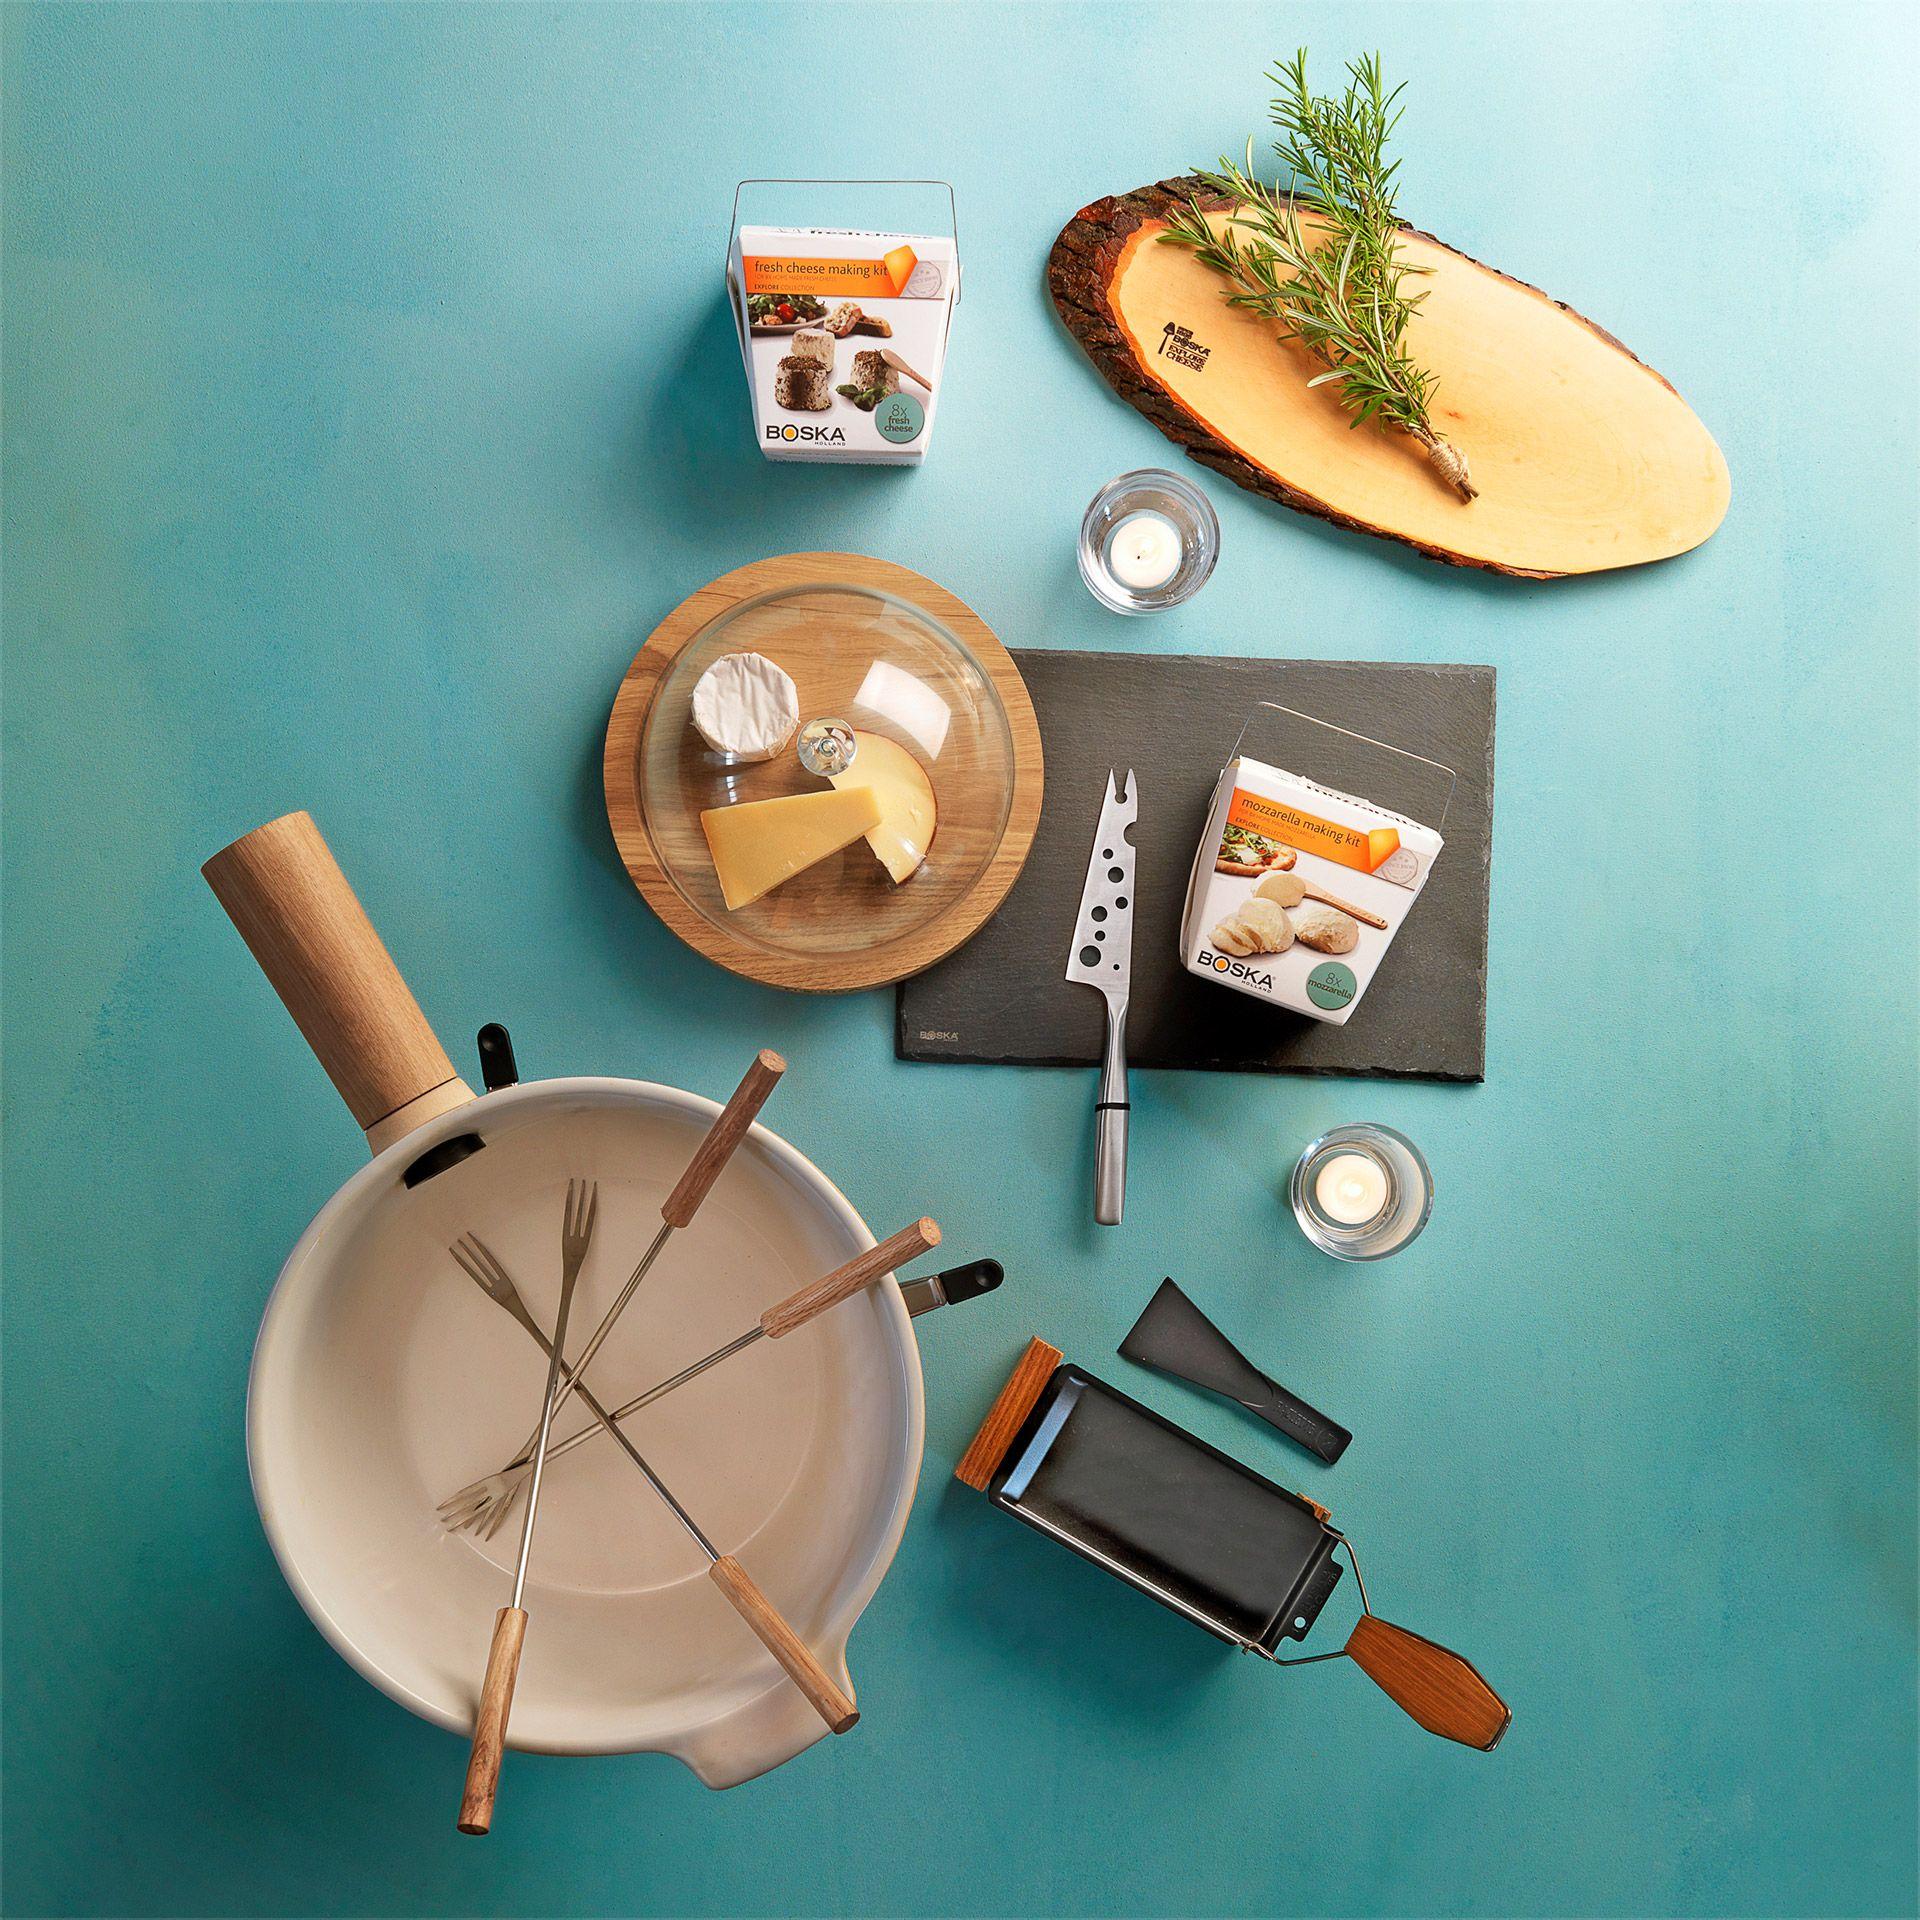 Shop Boska Cookware And Cheeseware